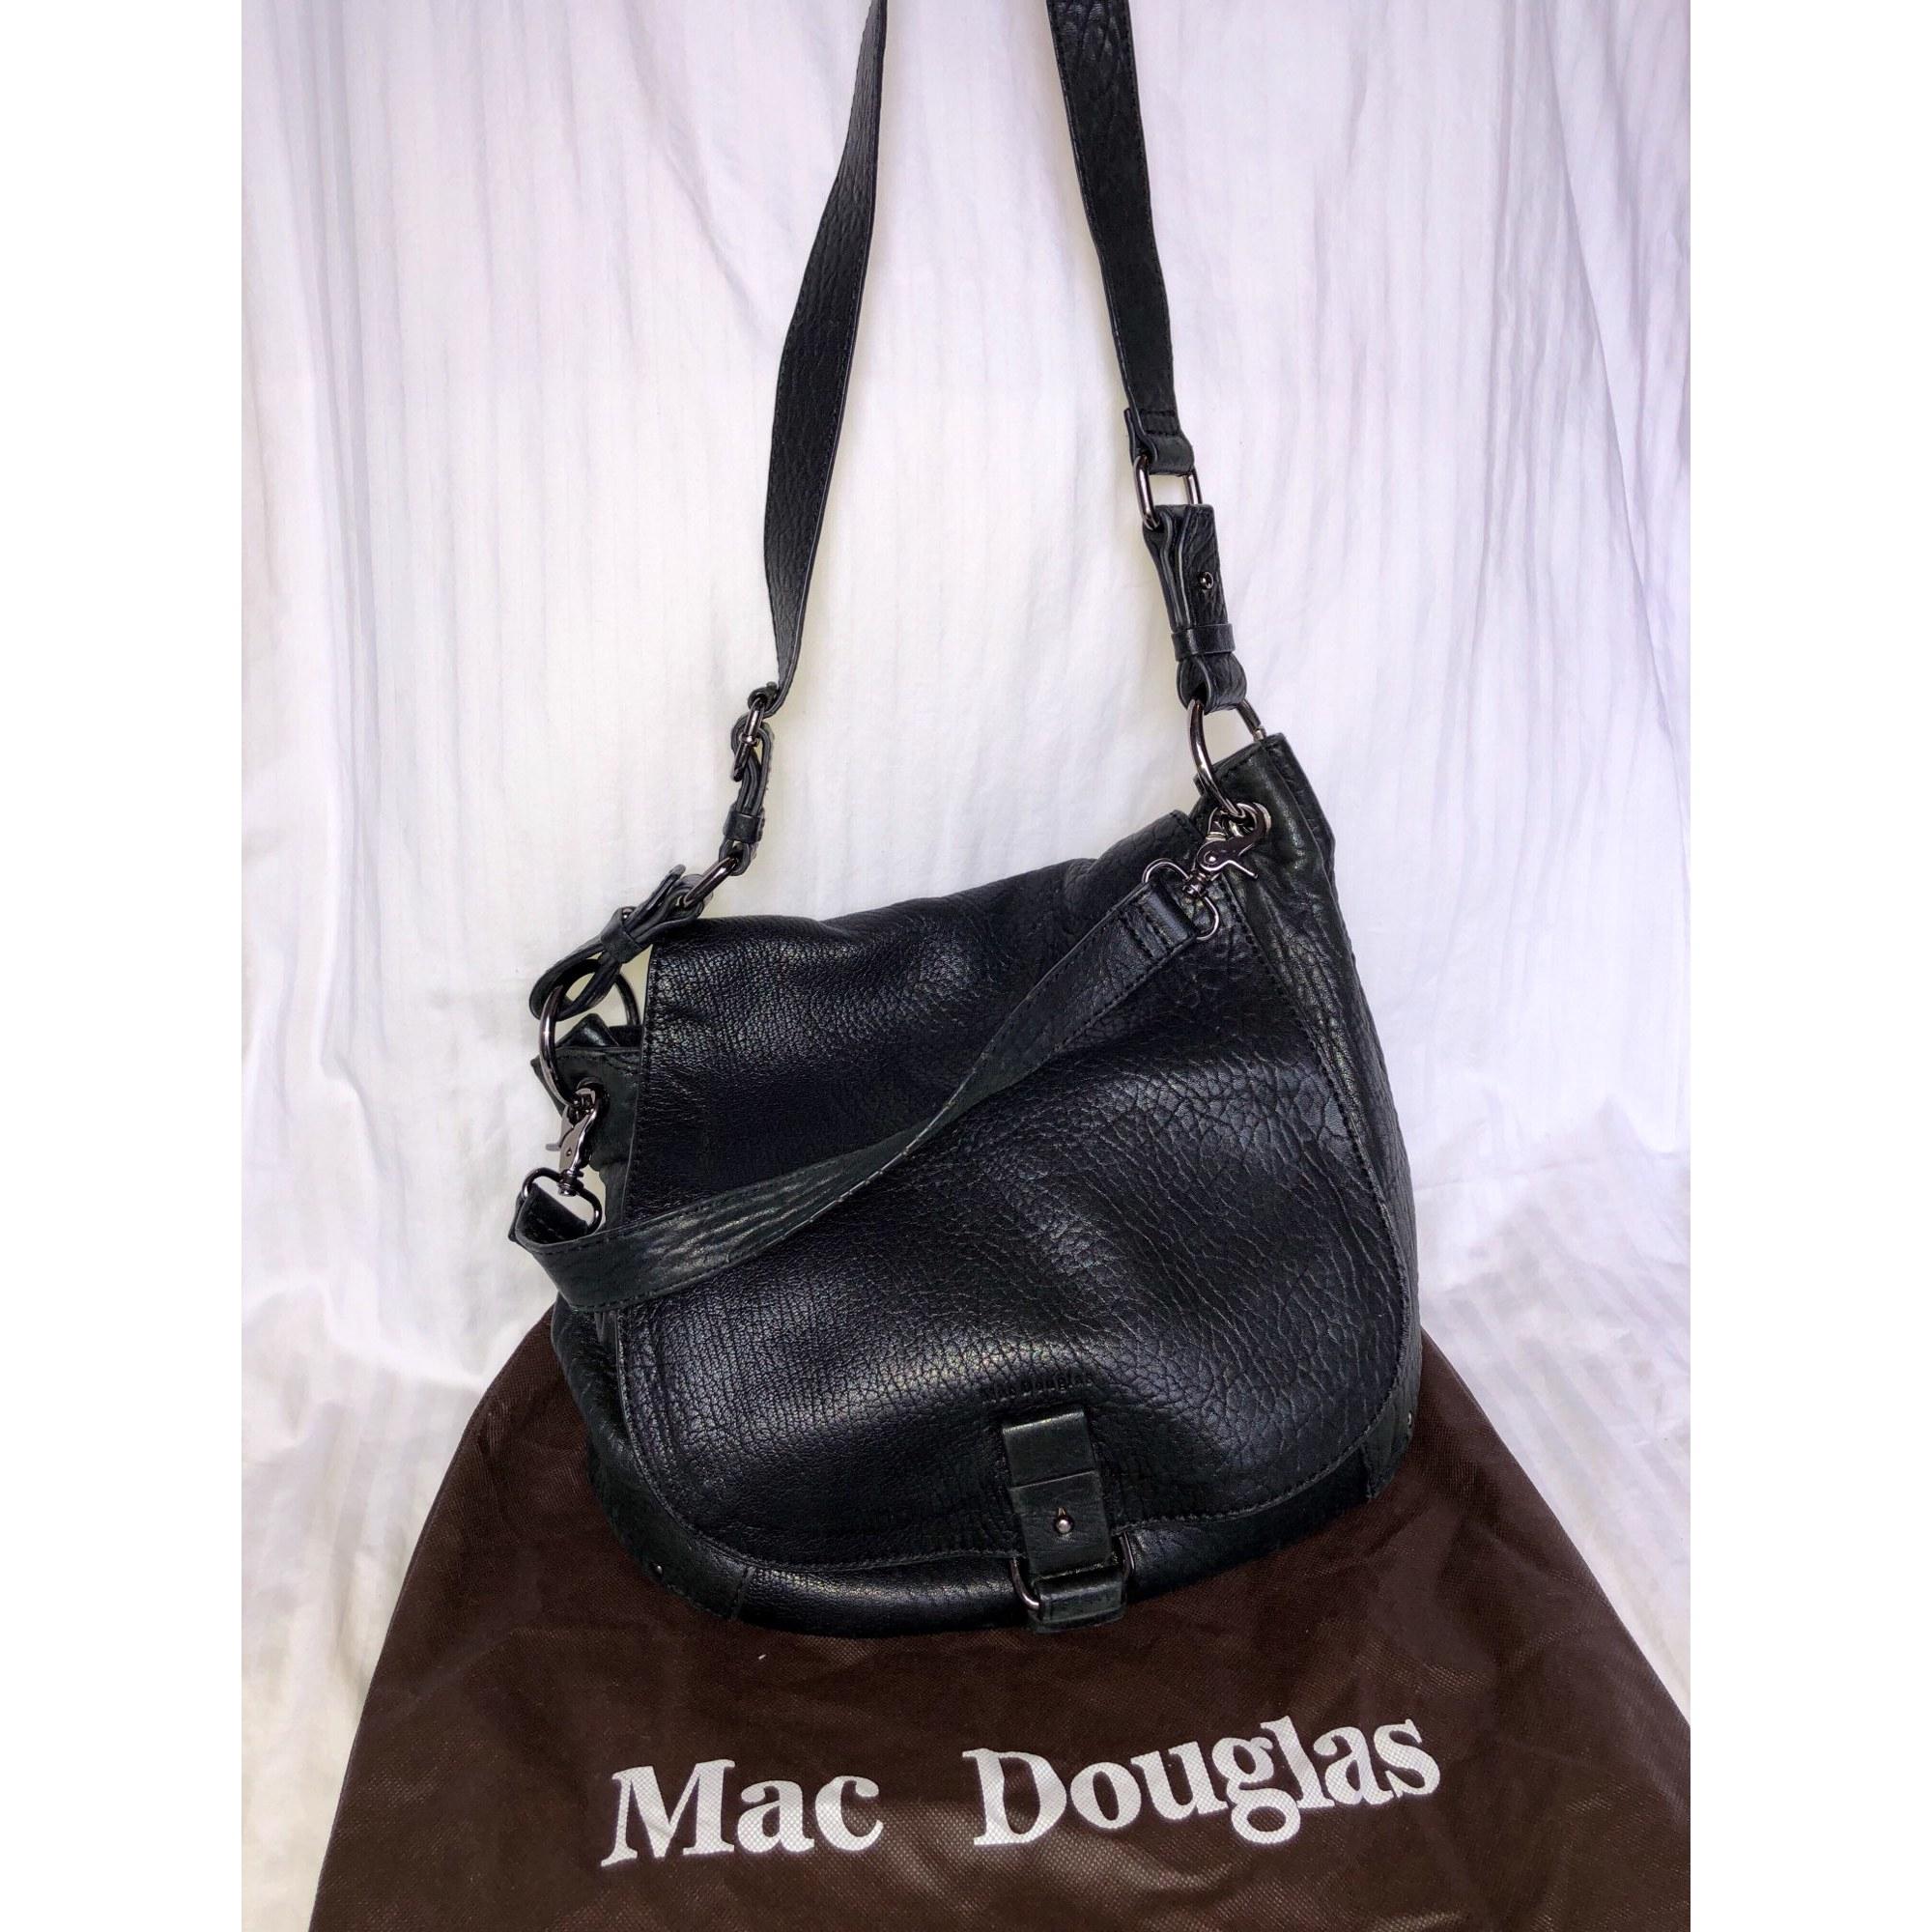 ccb389b5b7a4 Sac en bandoulière en cuir MAC DOUGLAS noir - 7295463